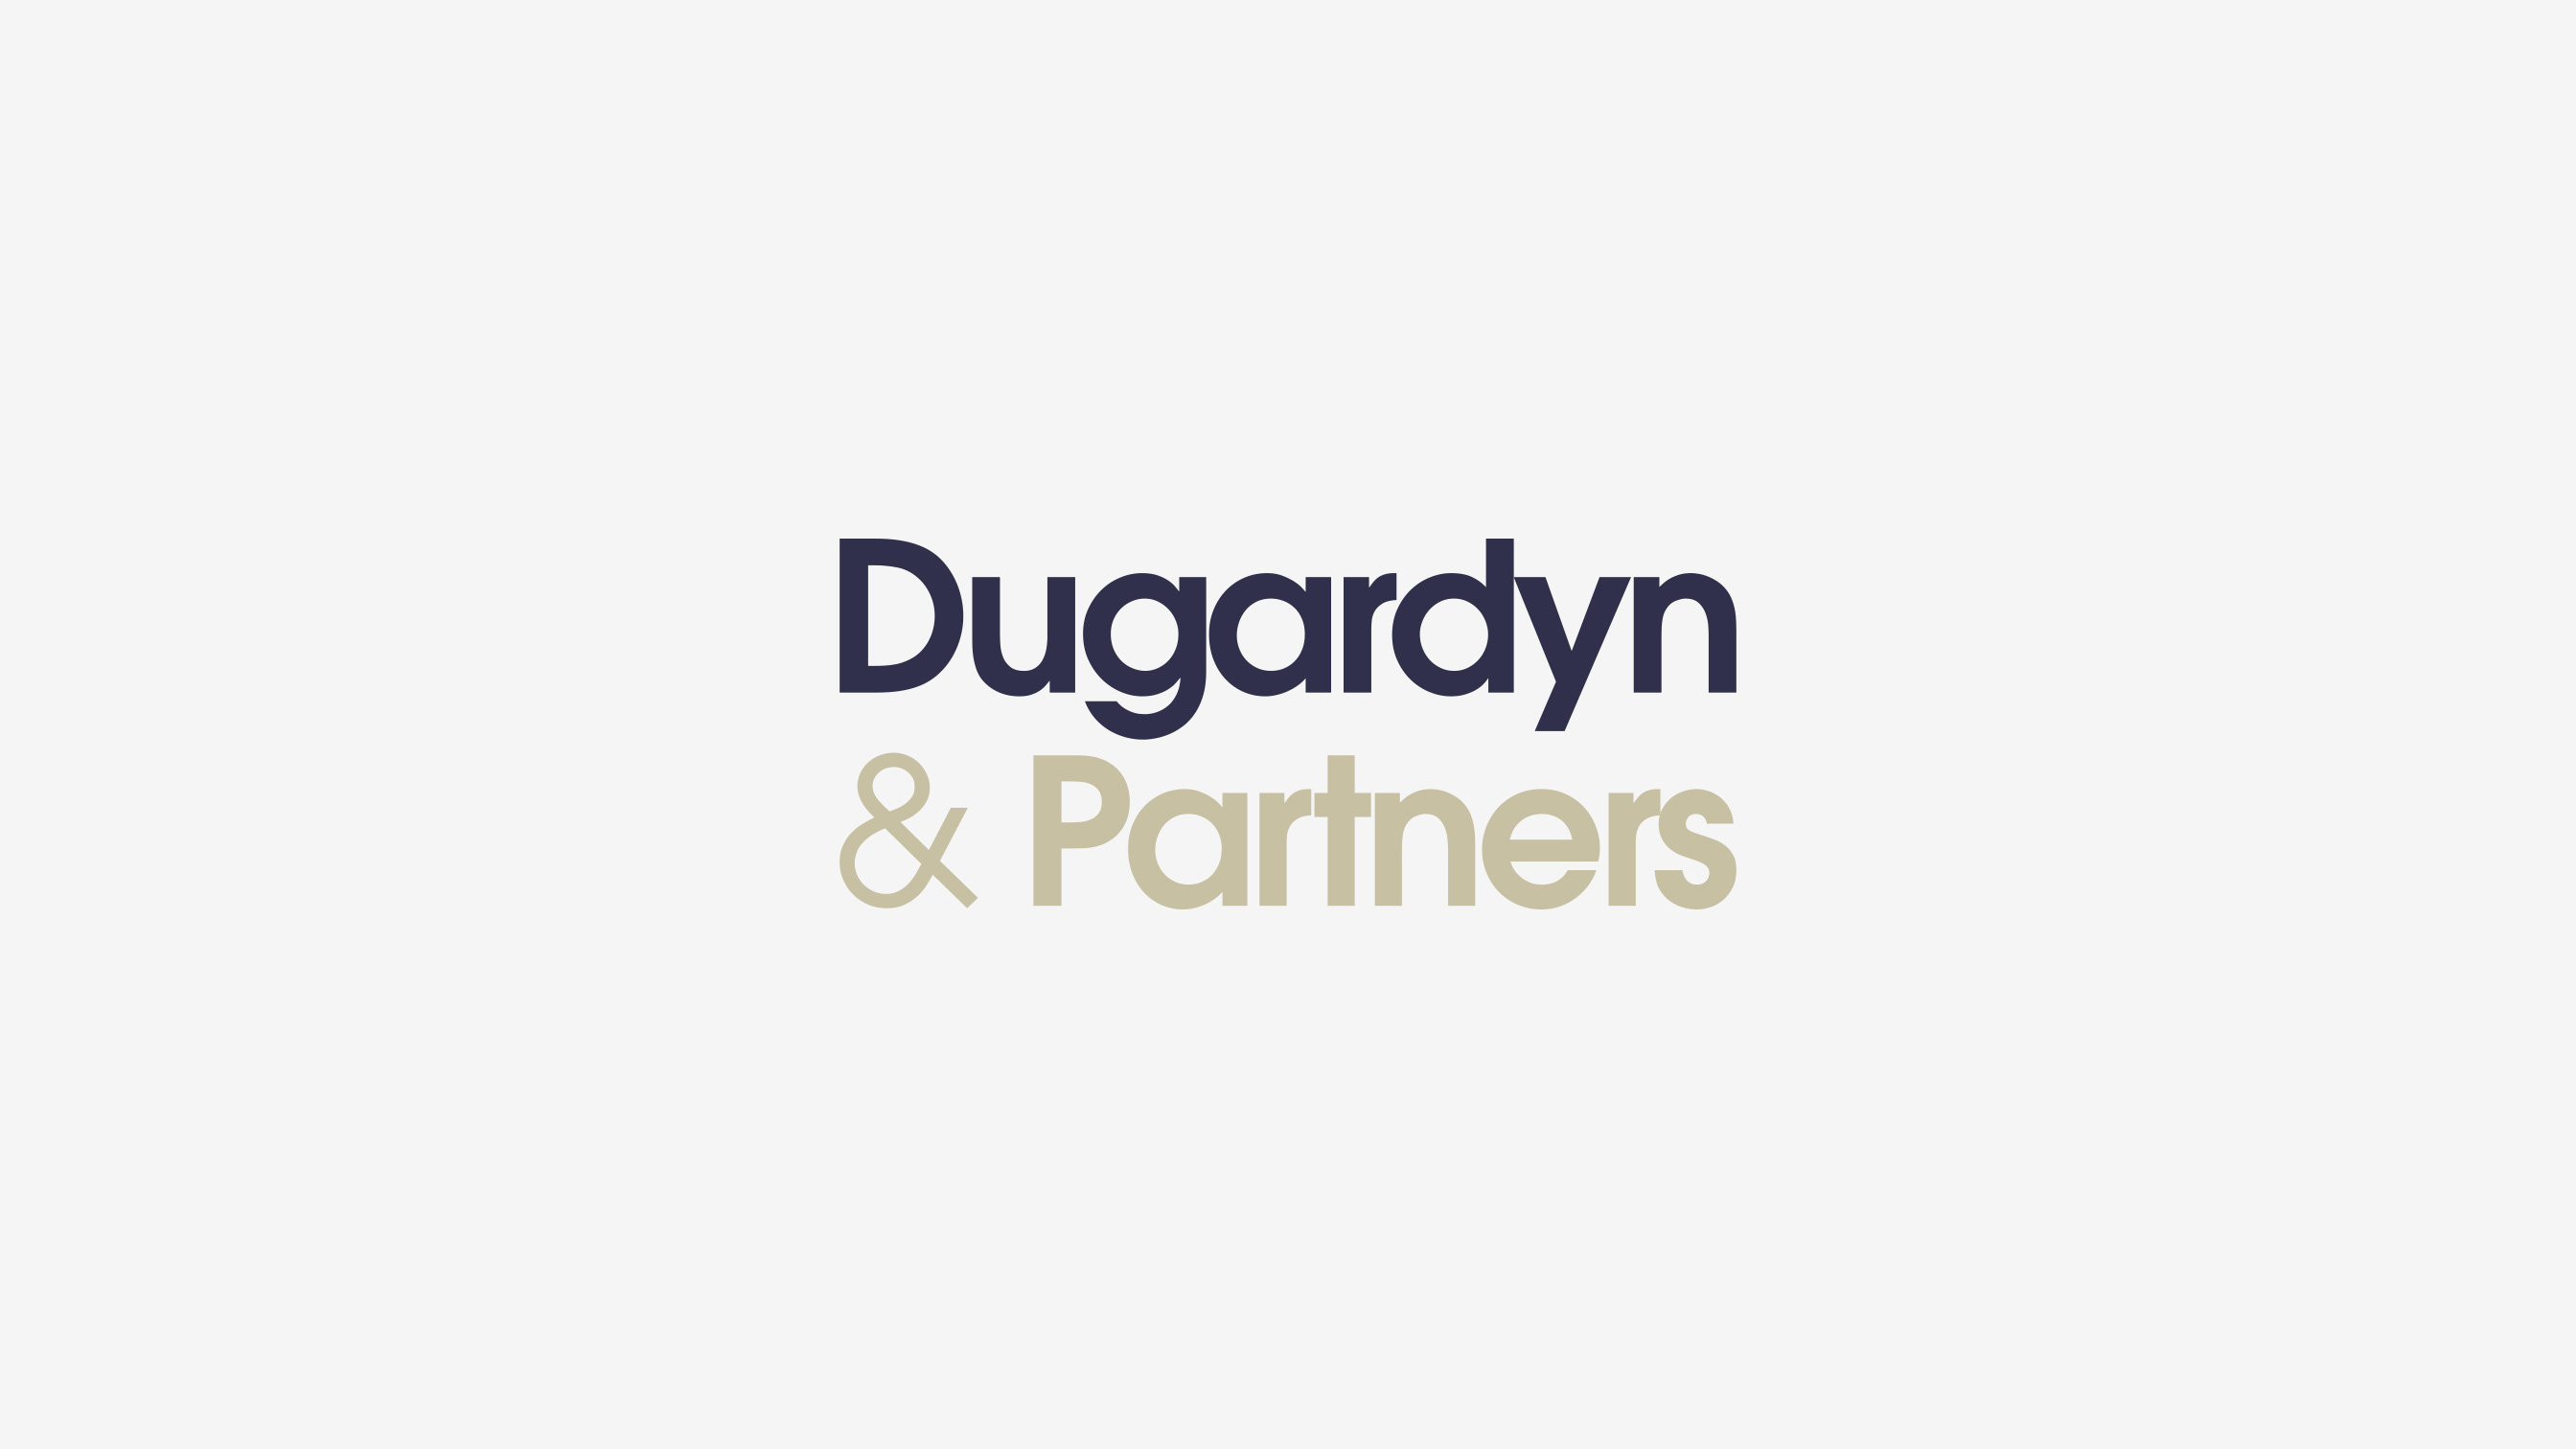 01-dugardyn-et-partners-pikteo-webdesign-graphic-design-freelance-paris-bruxelles-londres